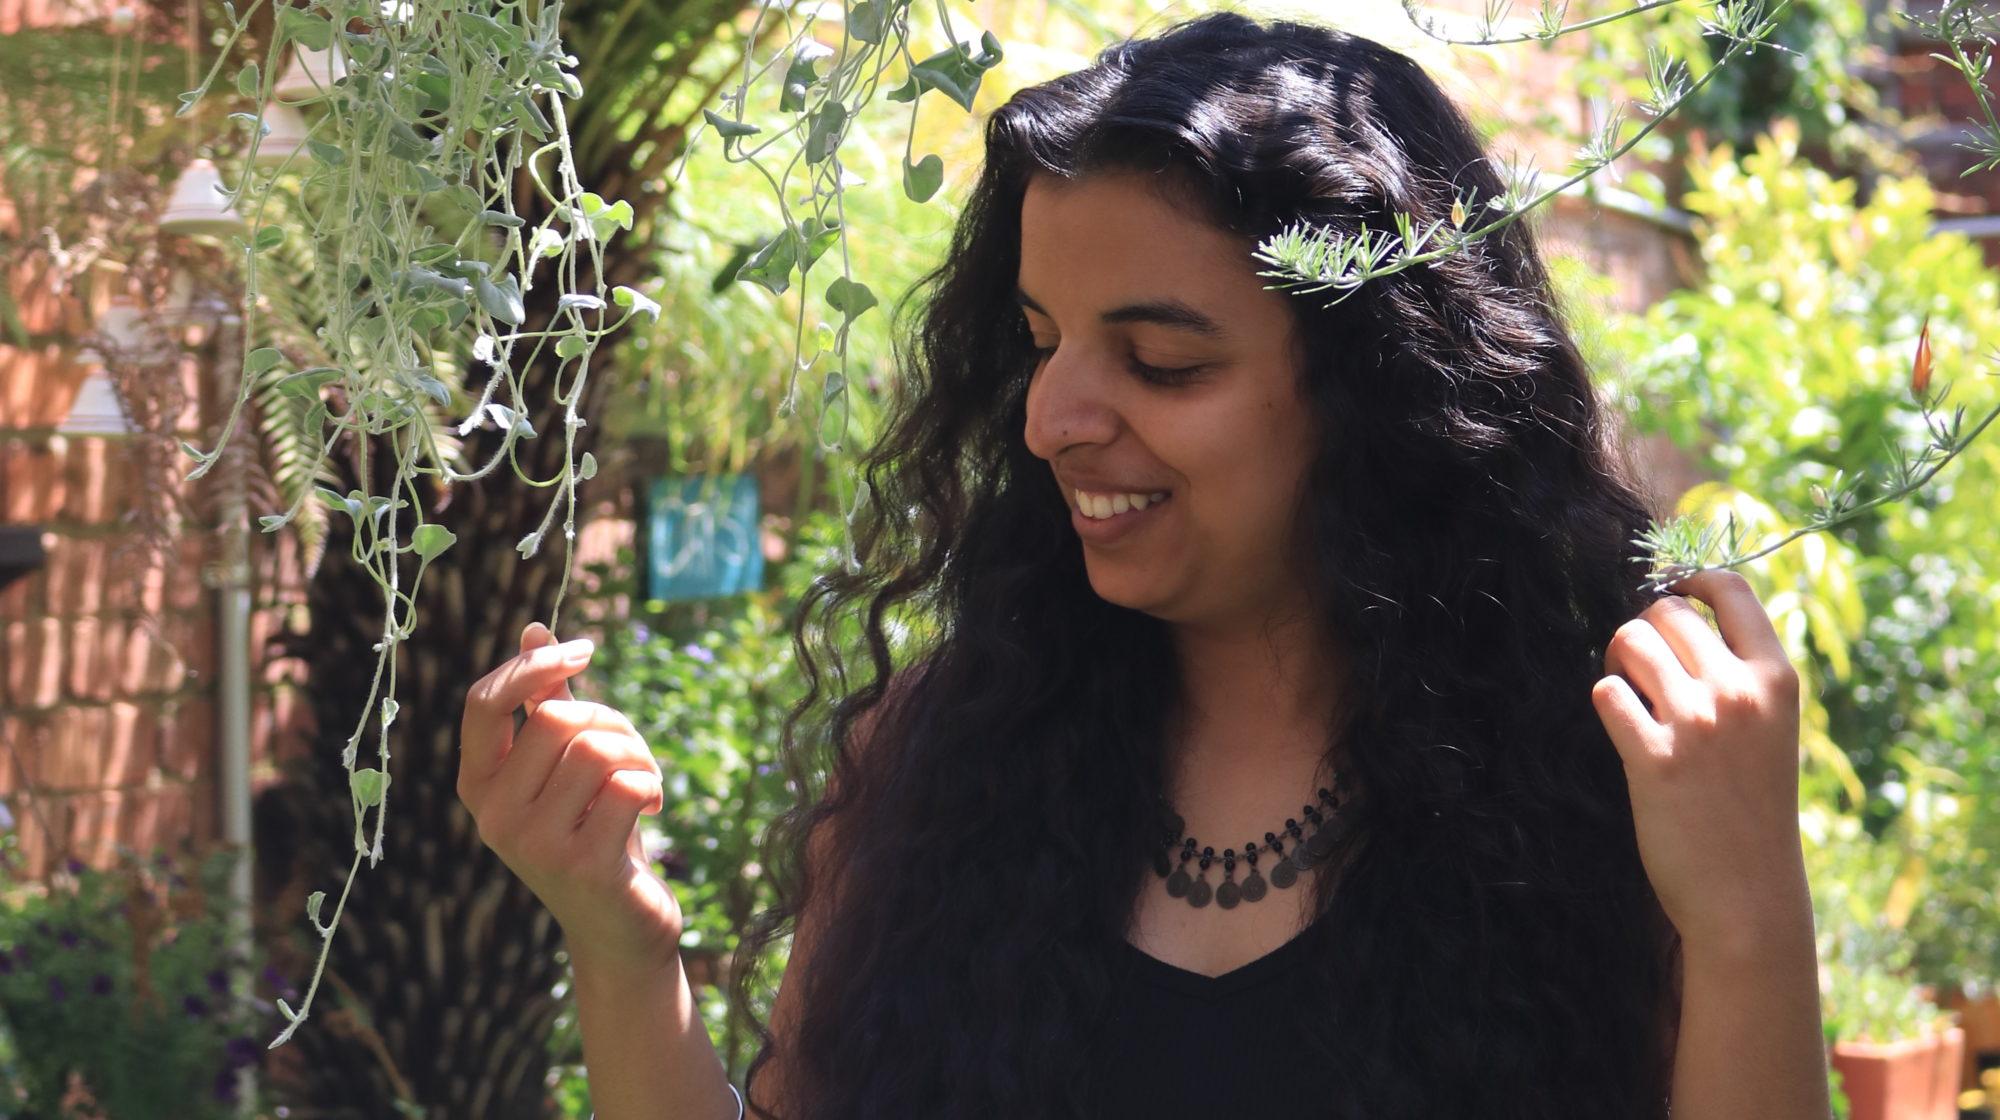 Hudgens enger Sikh Girl Big Boob Fotos von nackten